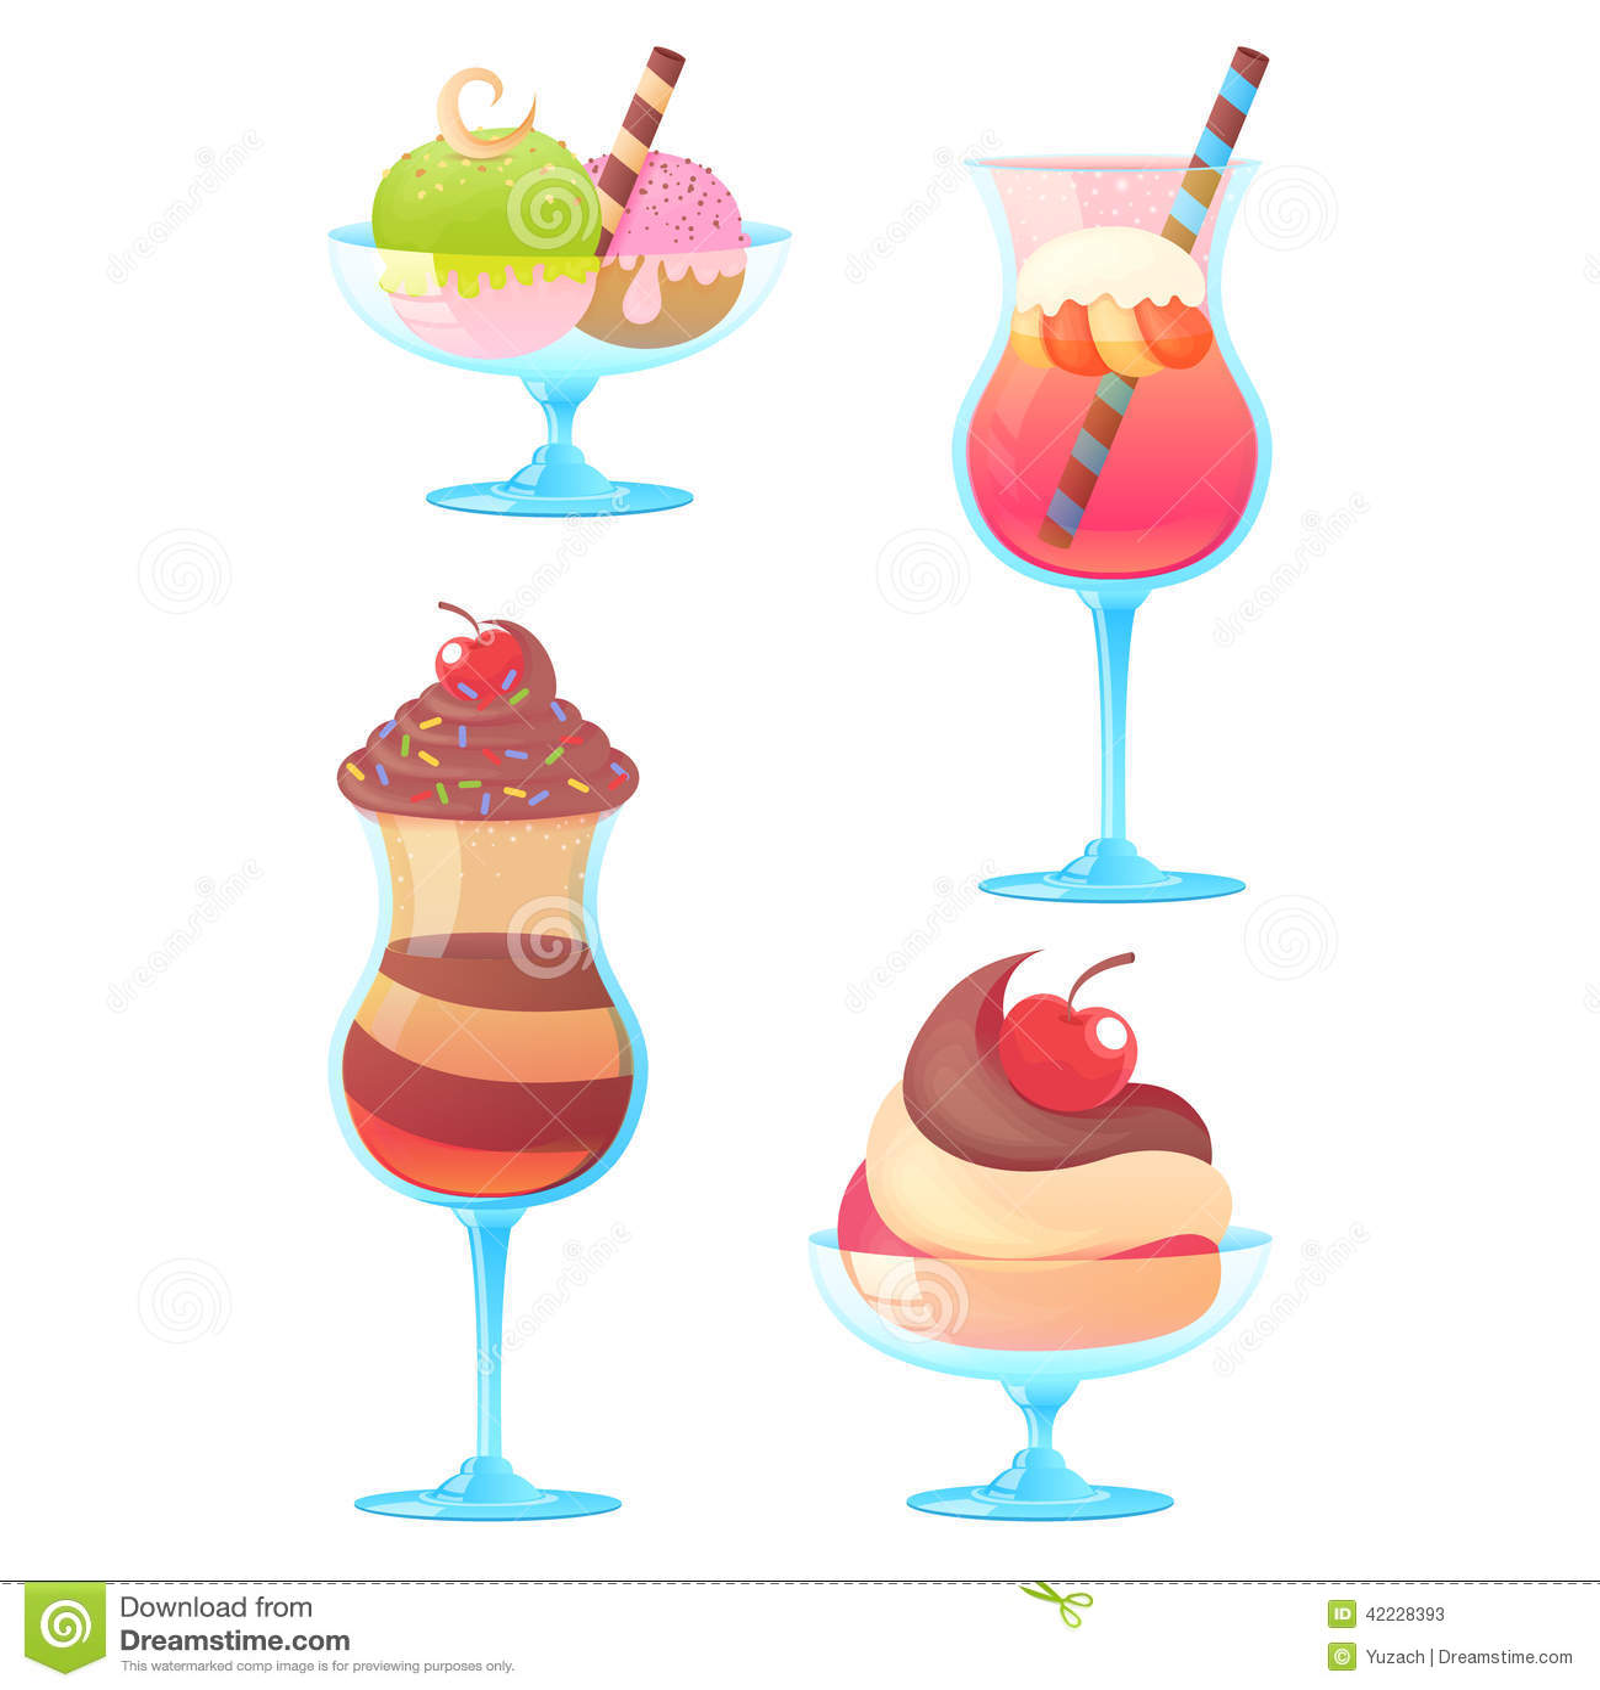 Delicious realistic ice-cream set on white background